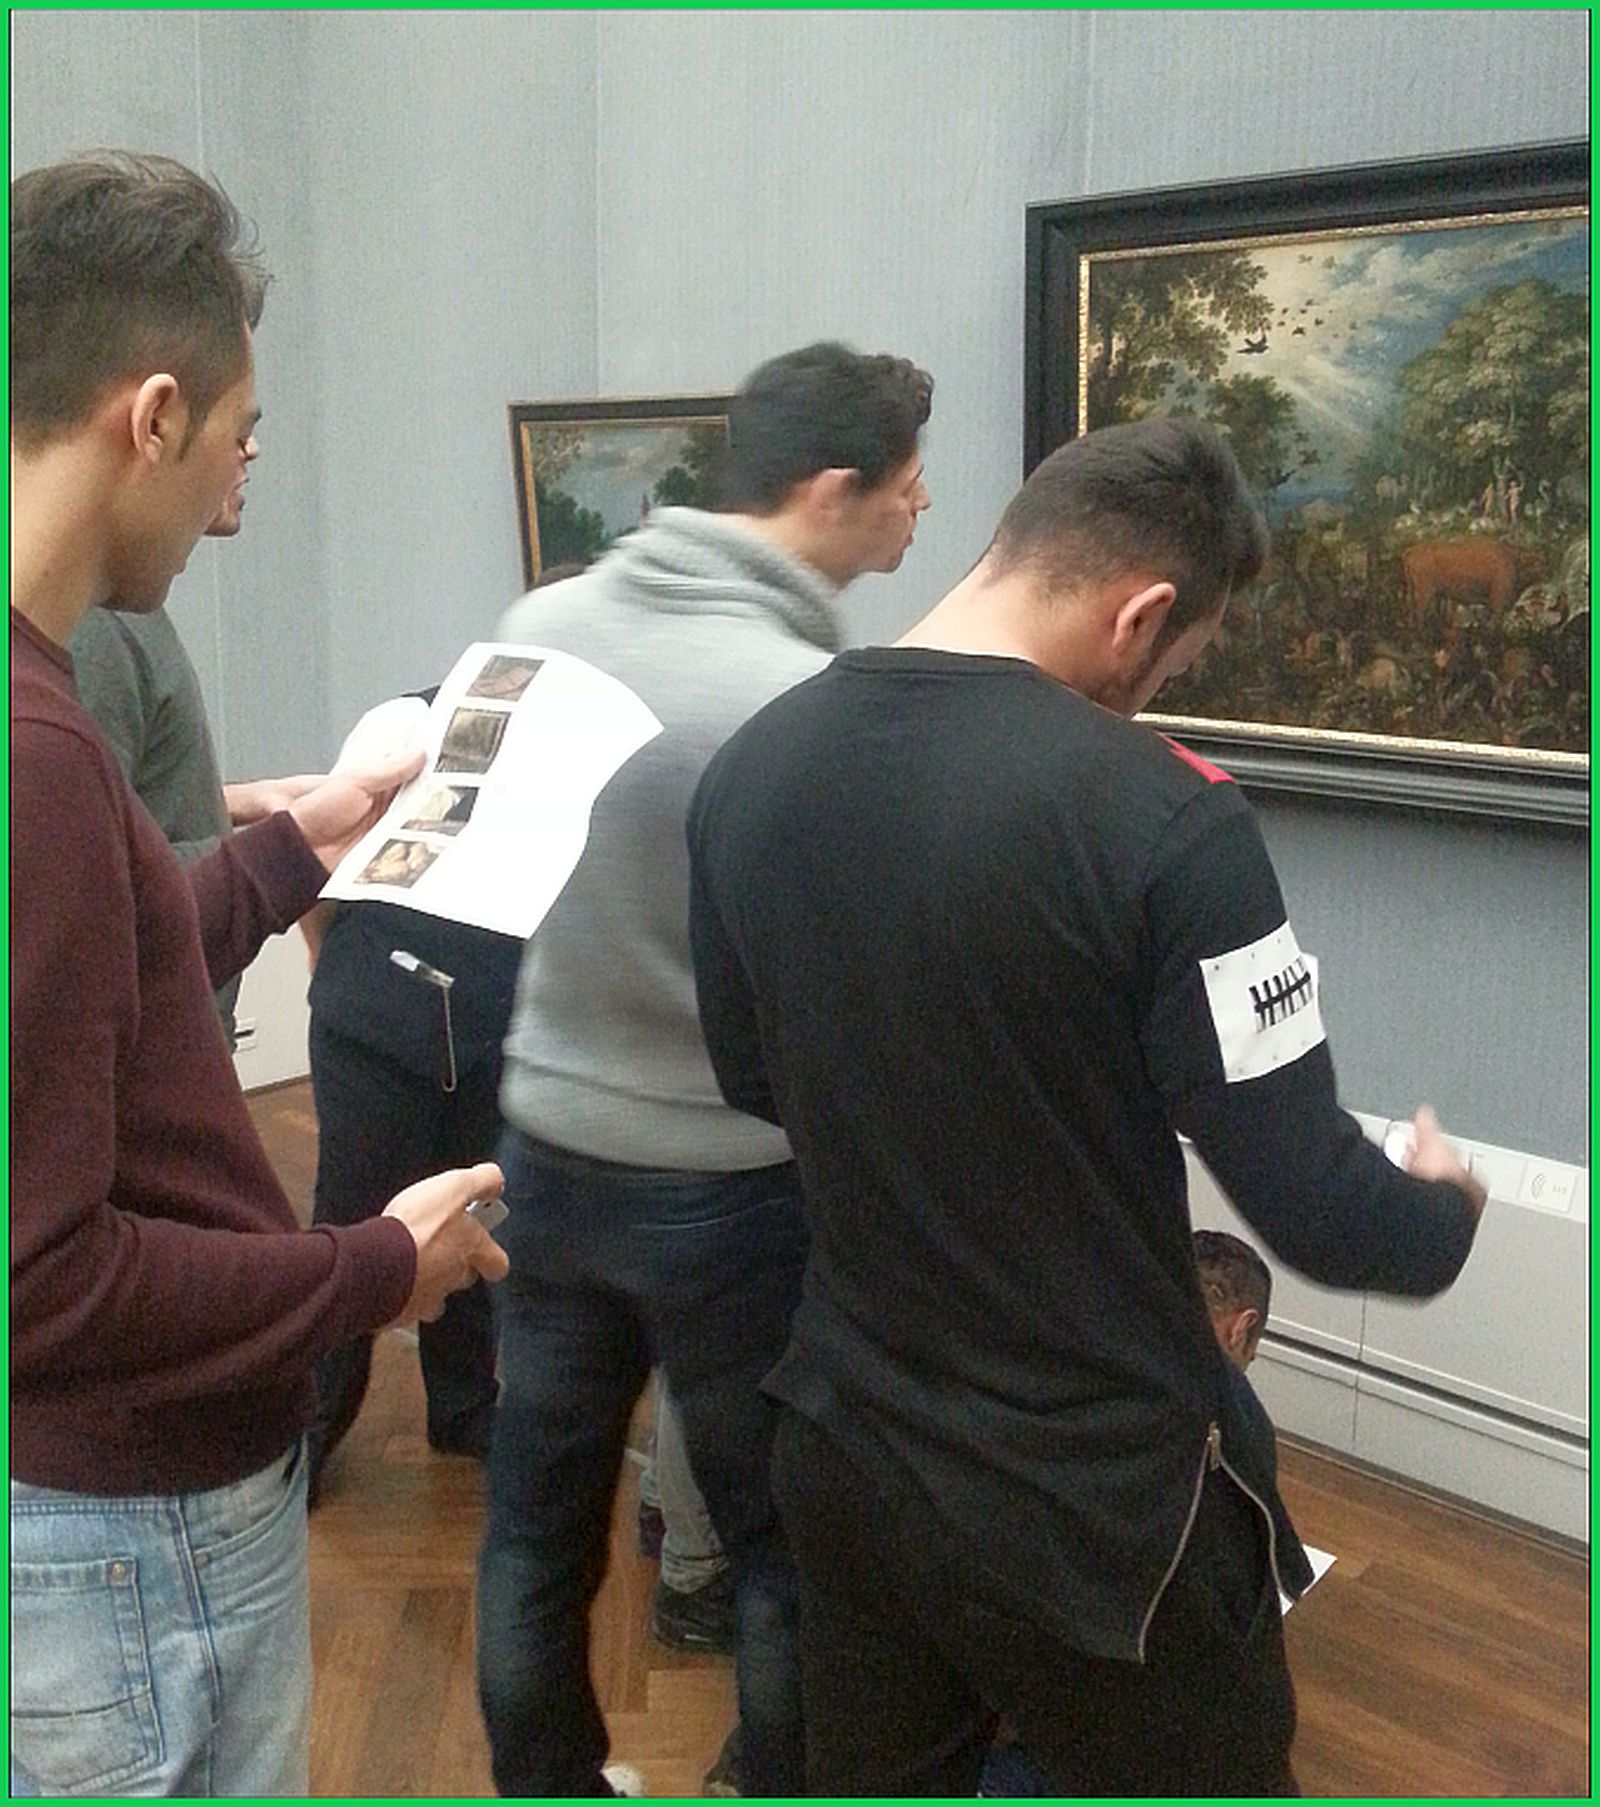 Museum-15.jpg